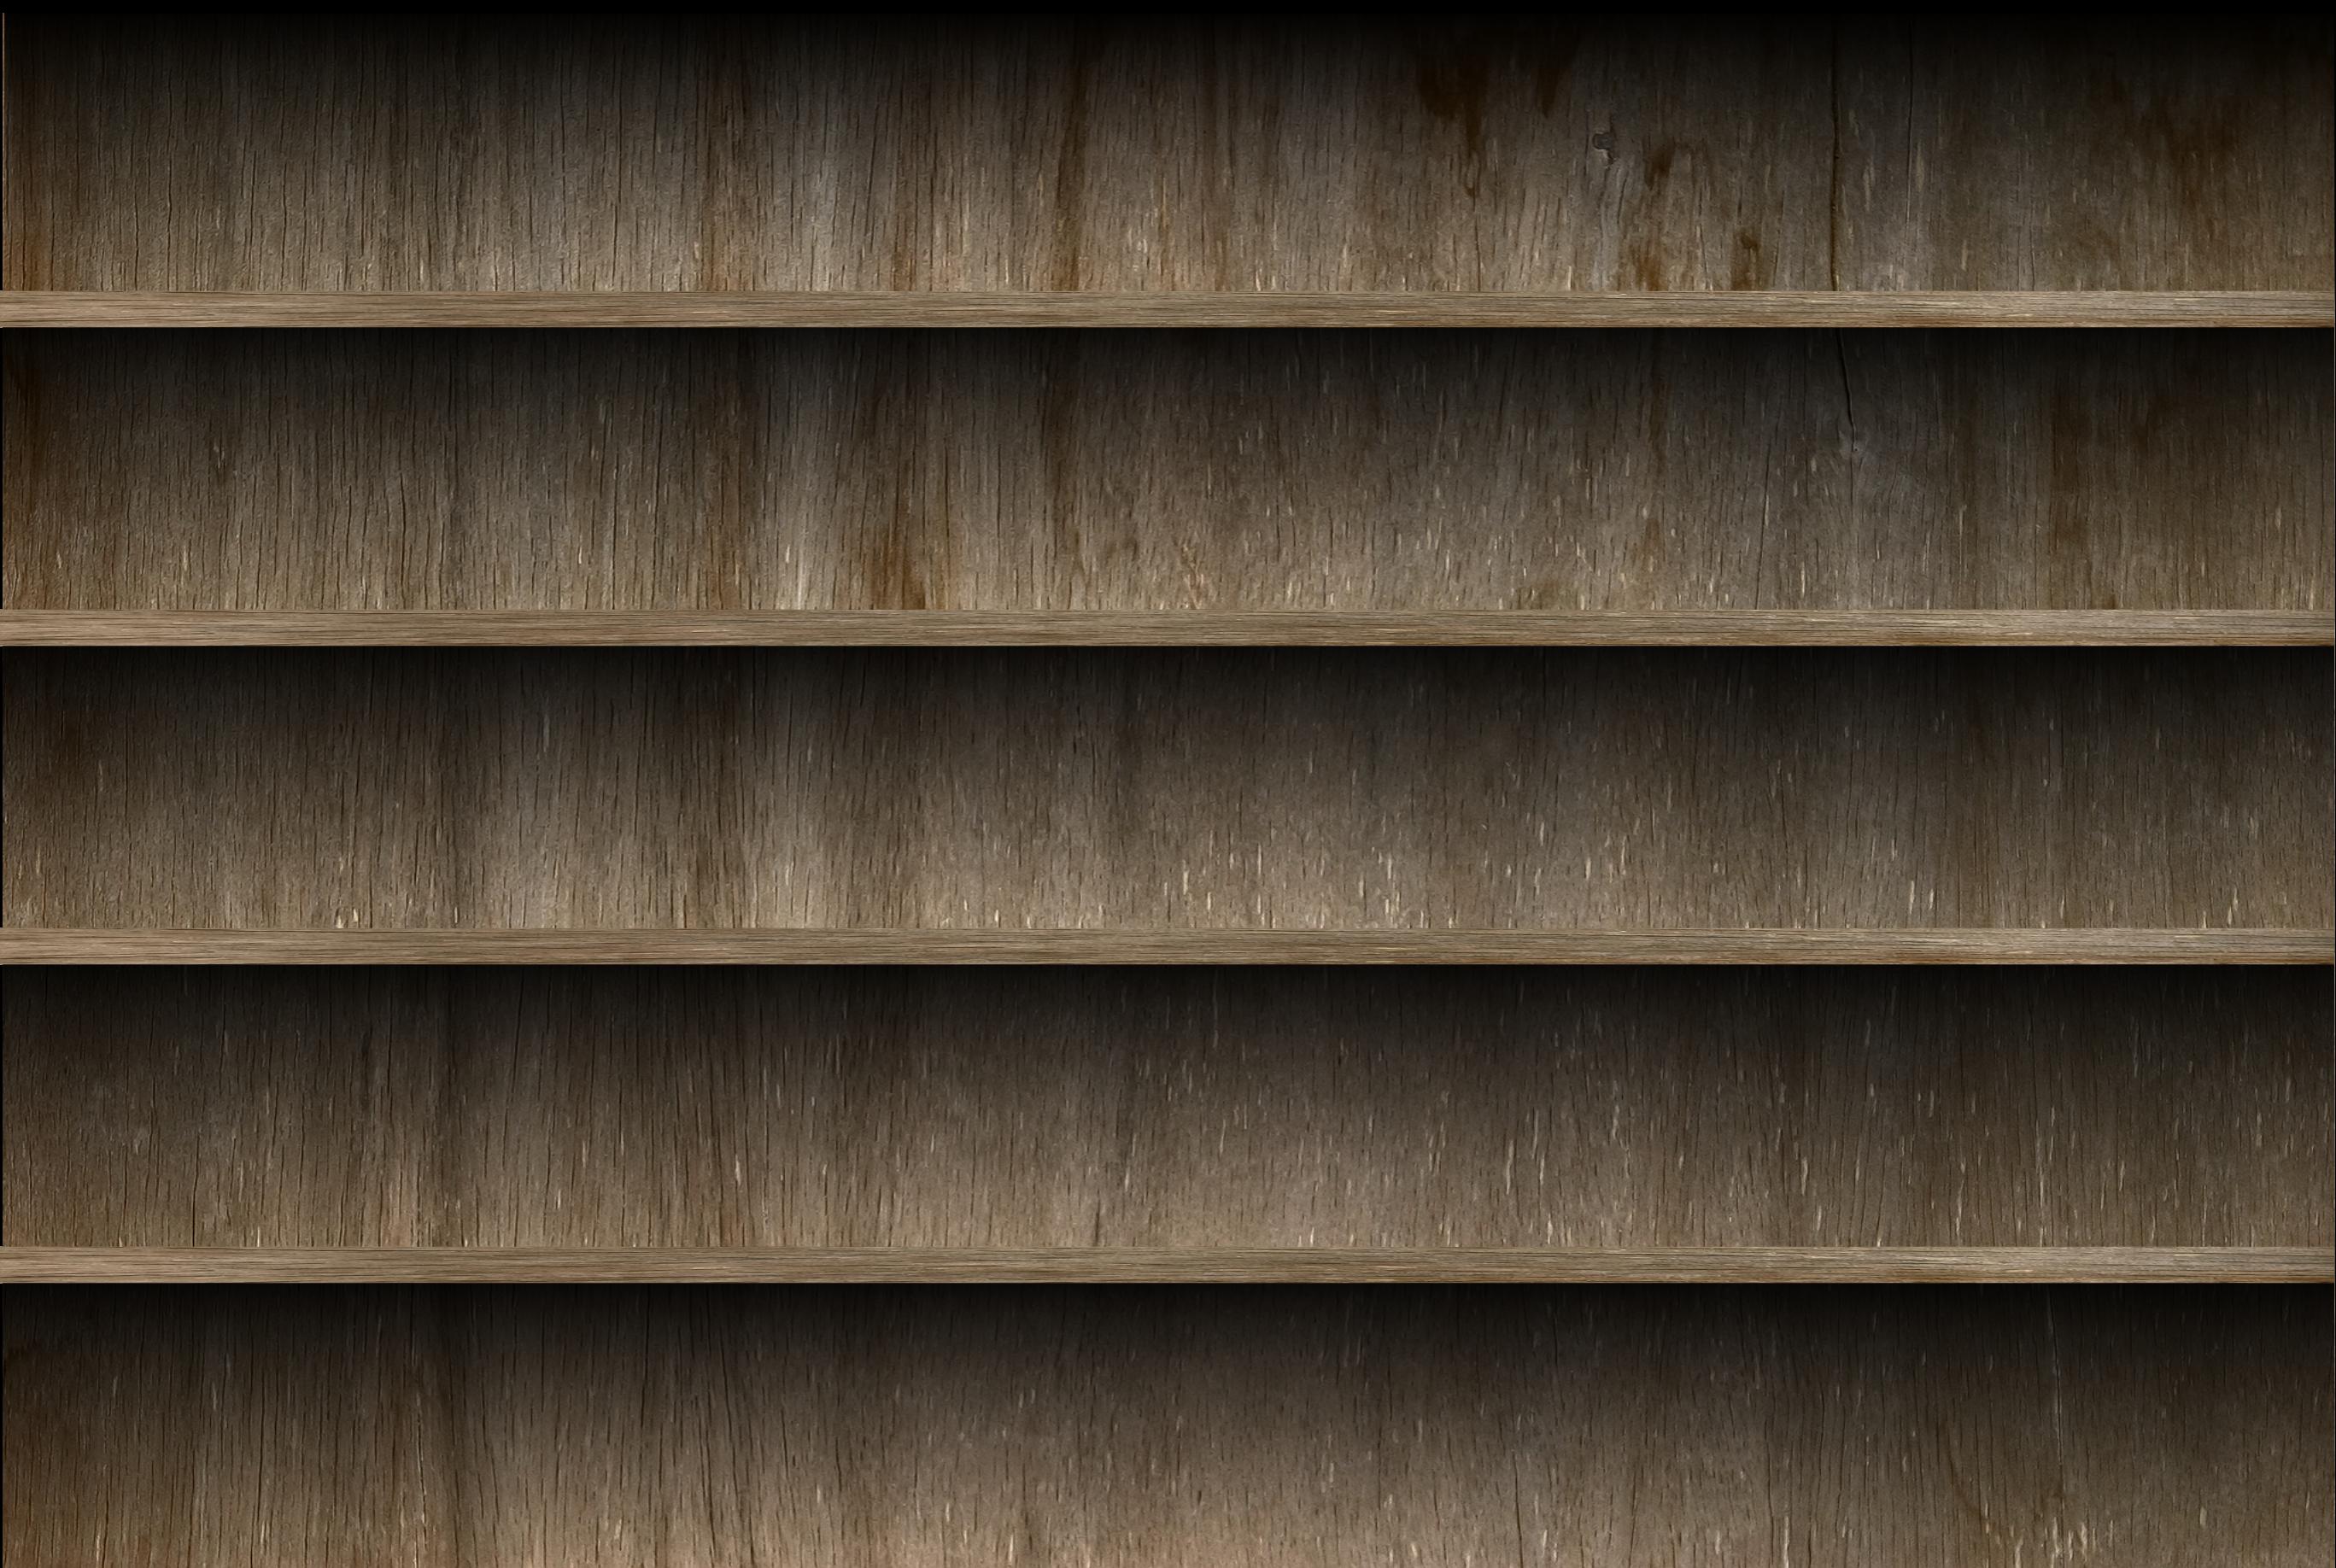 shelf2.png